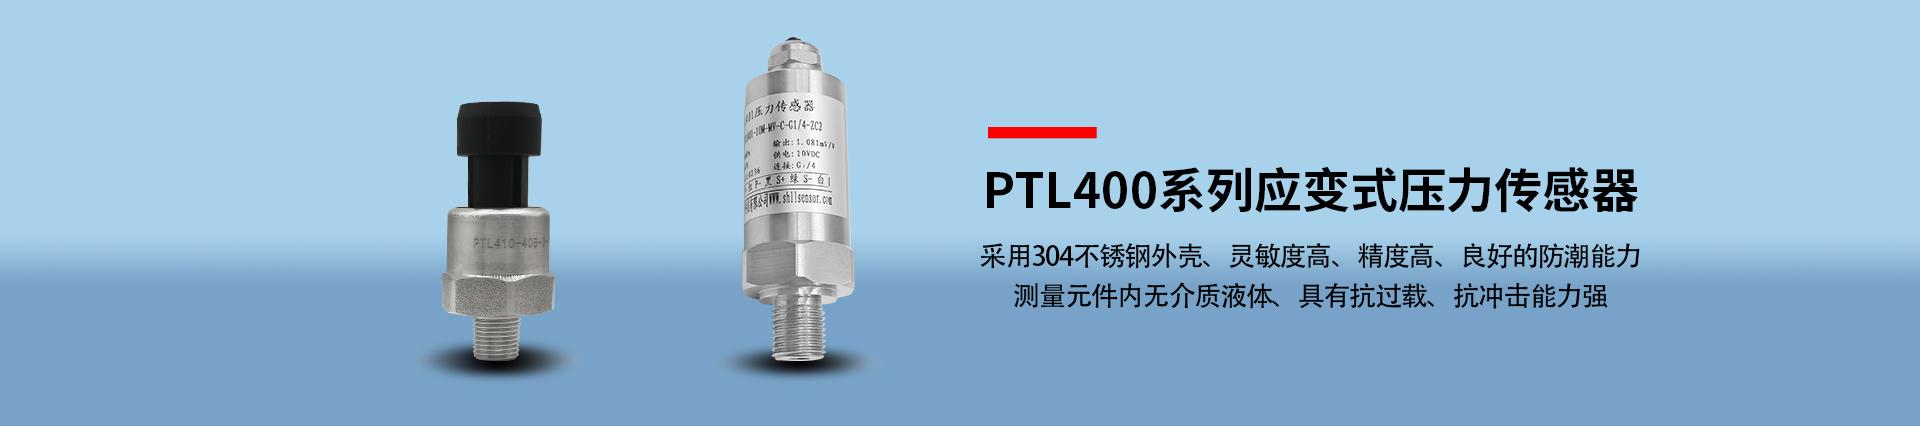 PTL400系列应变式压力传感器